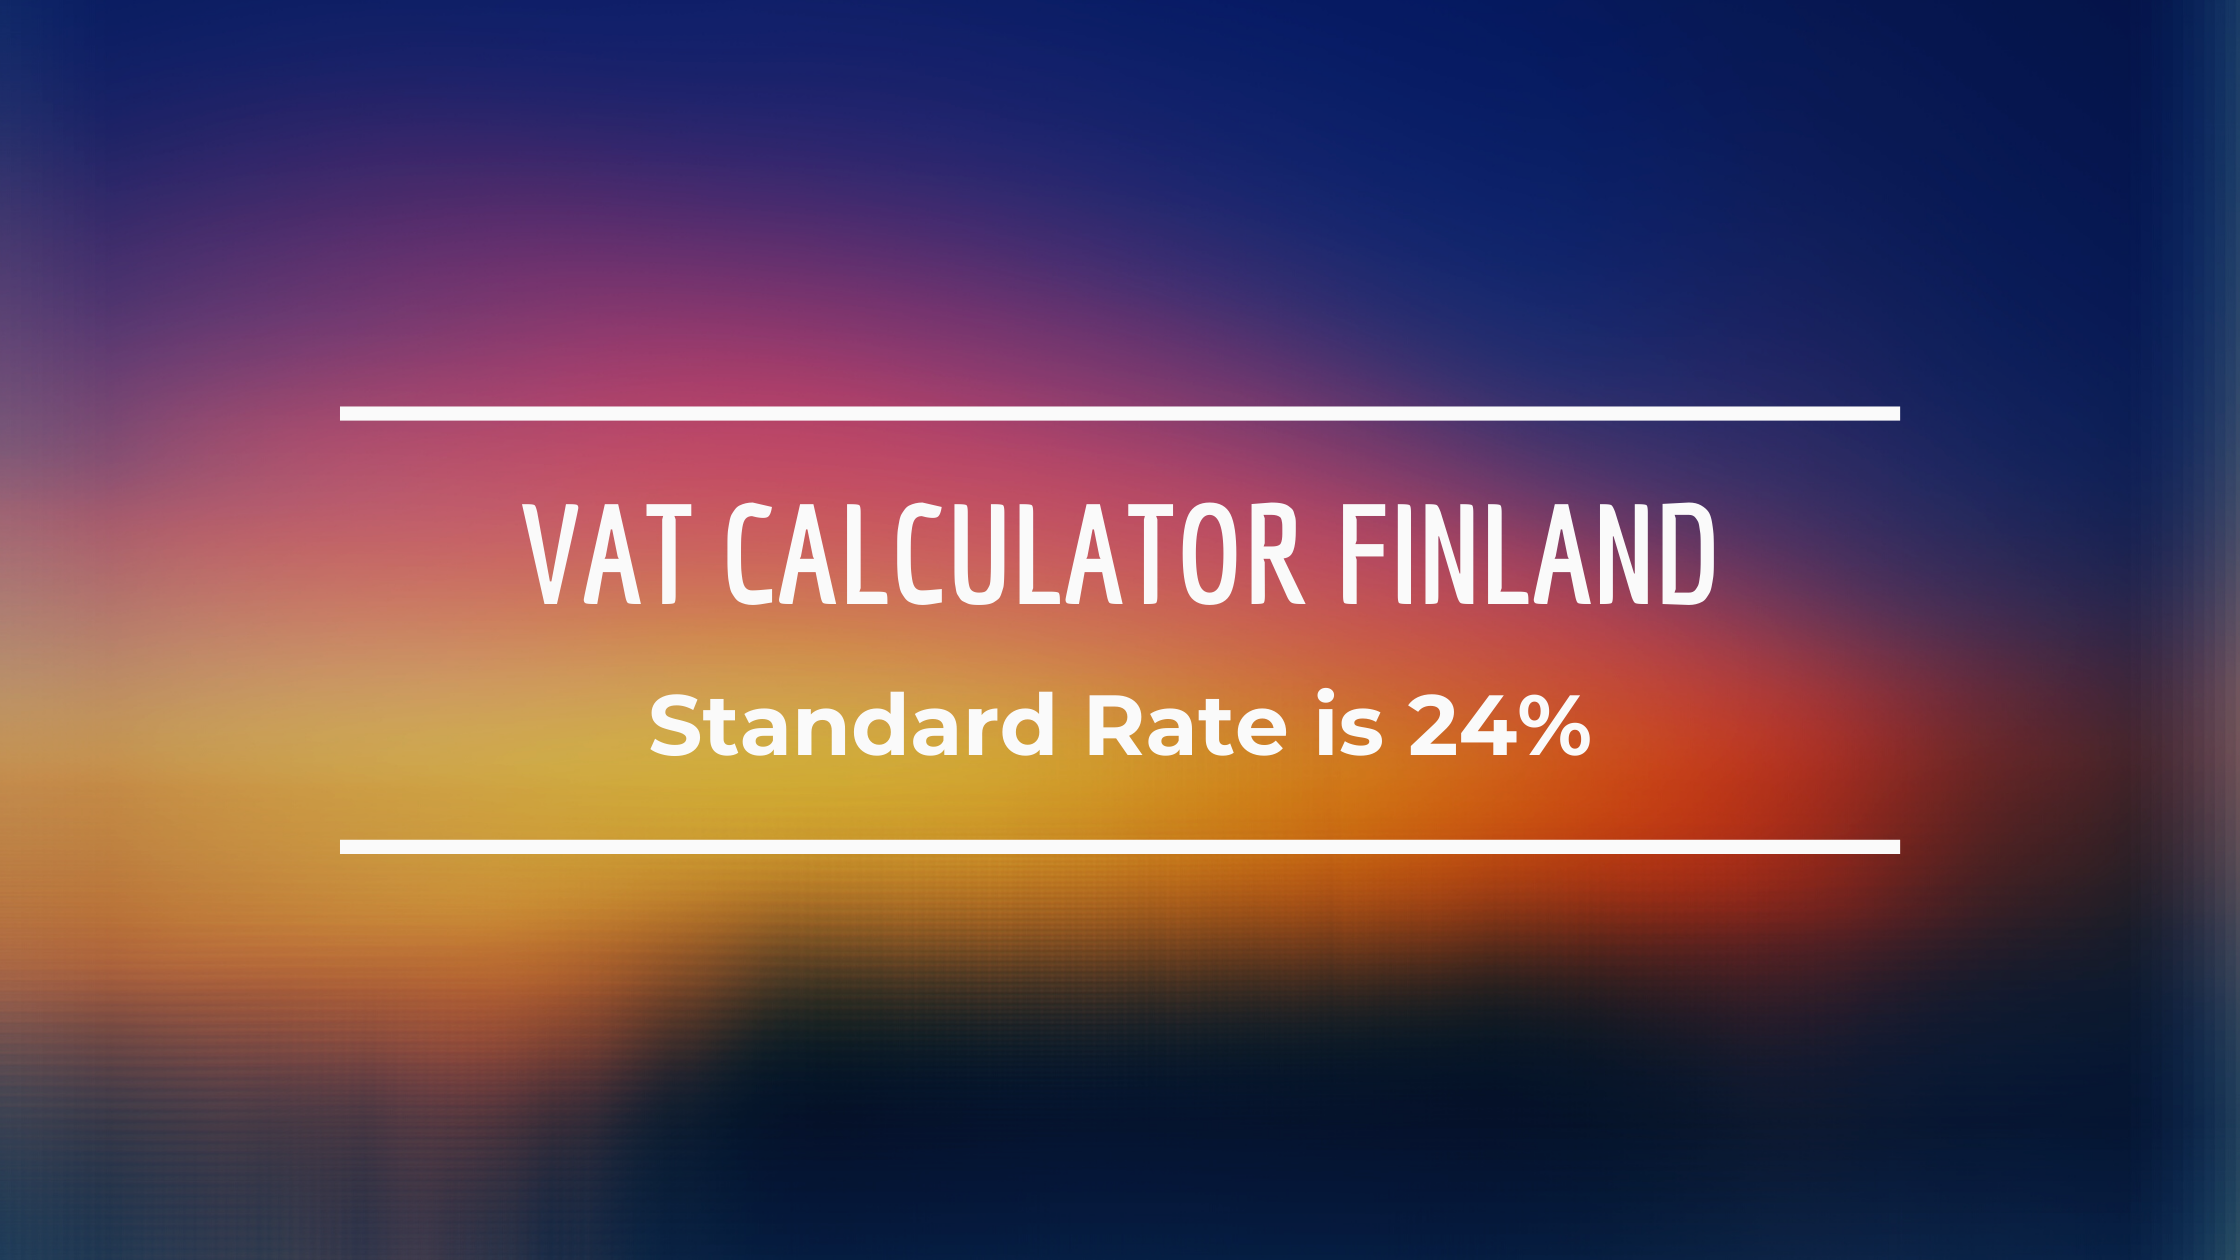 Vat Calculator Finland